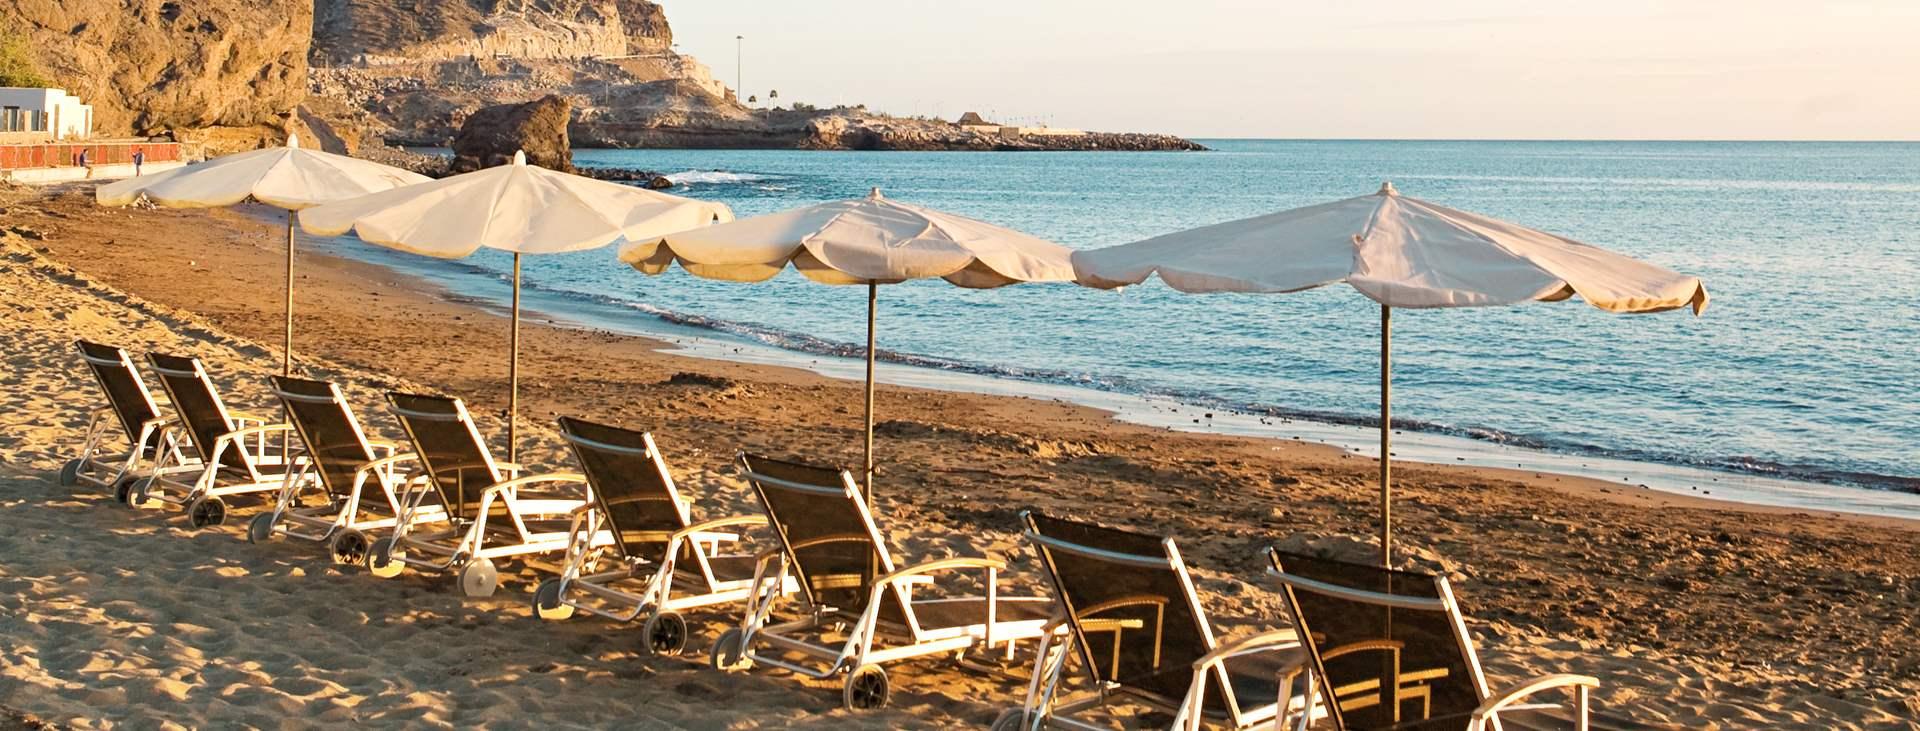 Boka en resa med All Inclusive till Playa del Cura på Gran Canaria